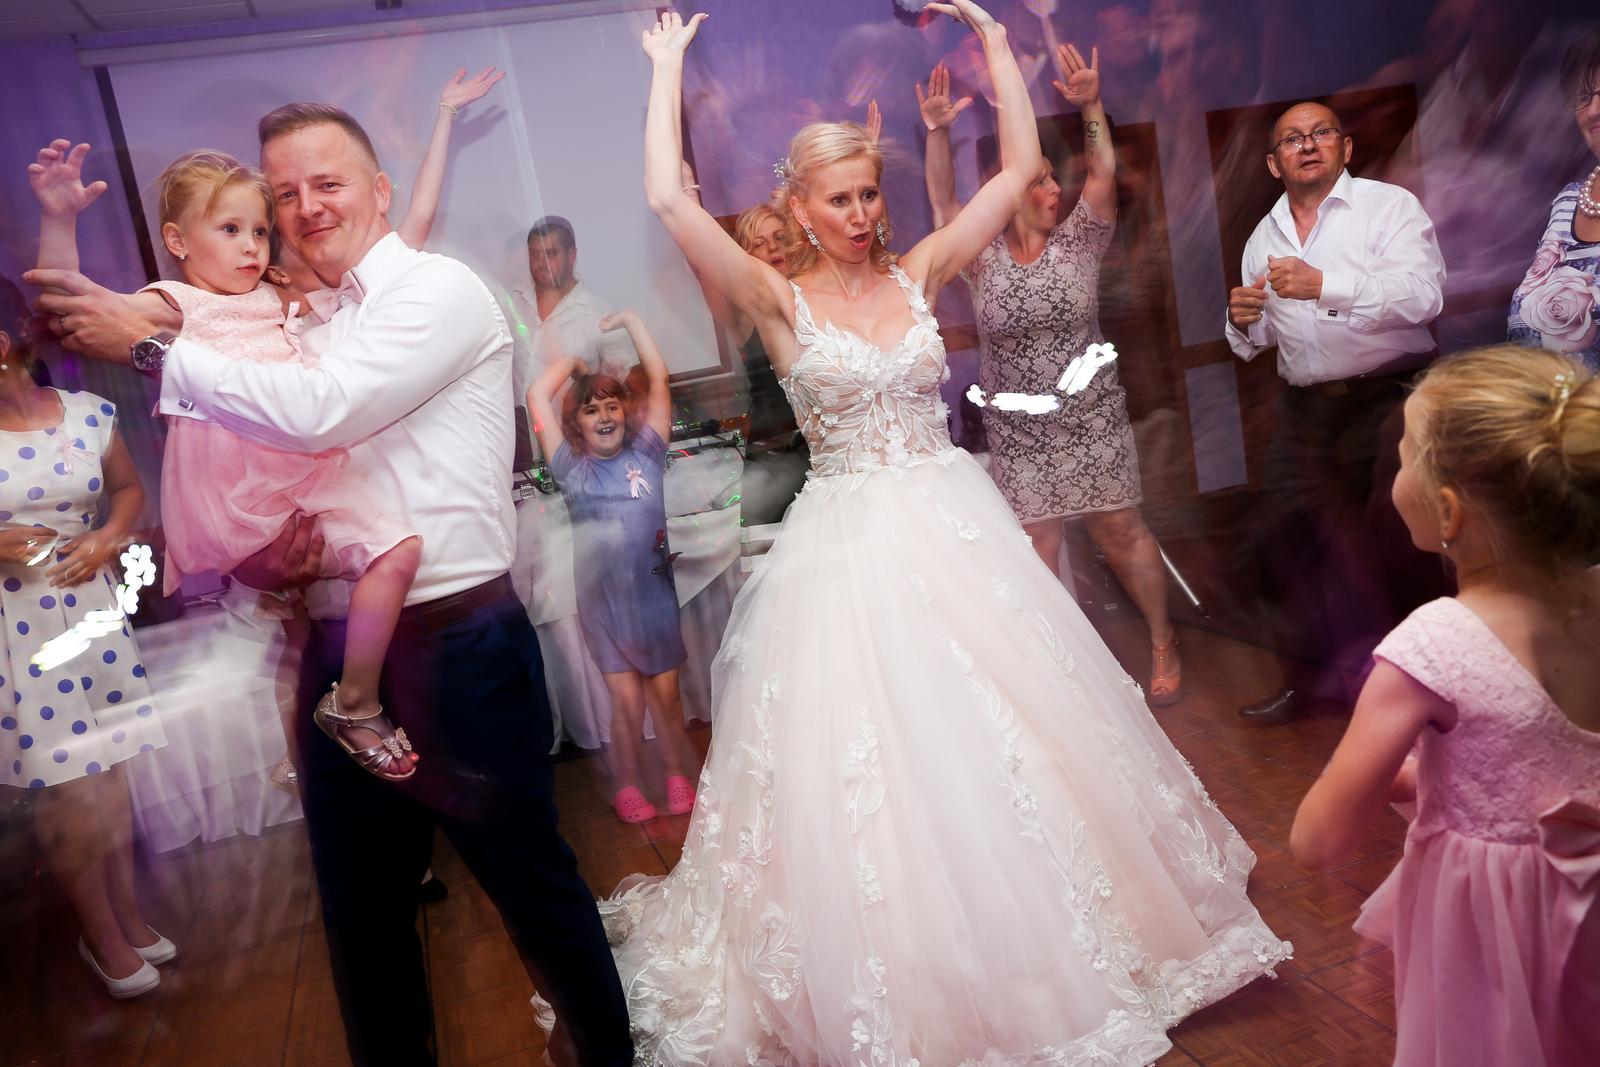 Lucka{{_AND_}}Marek - hop, hop, hop, hop, skáče celá svadba...